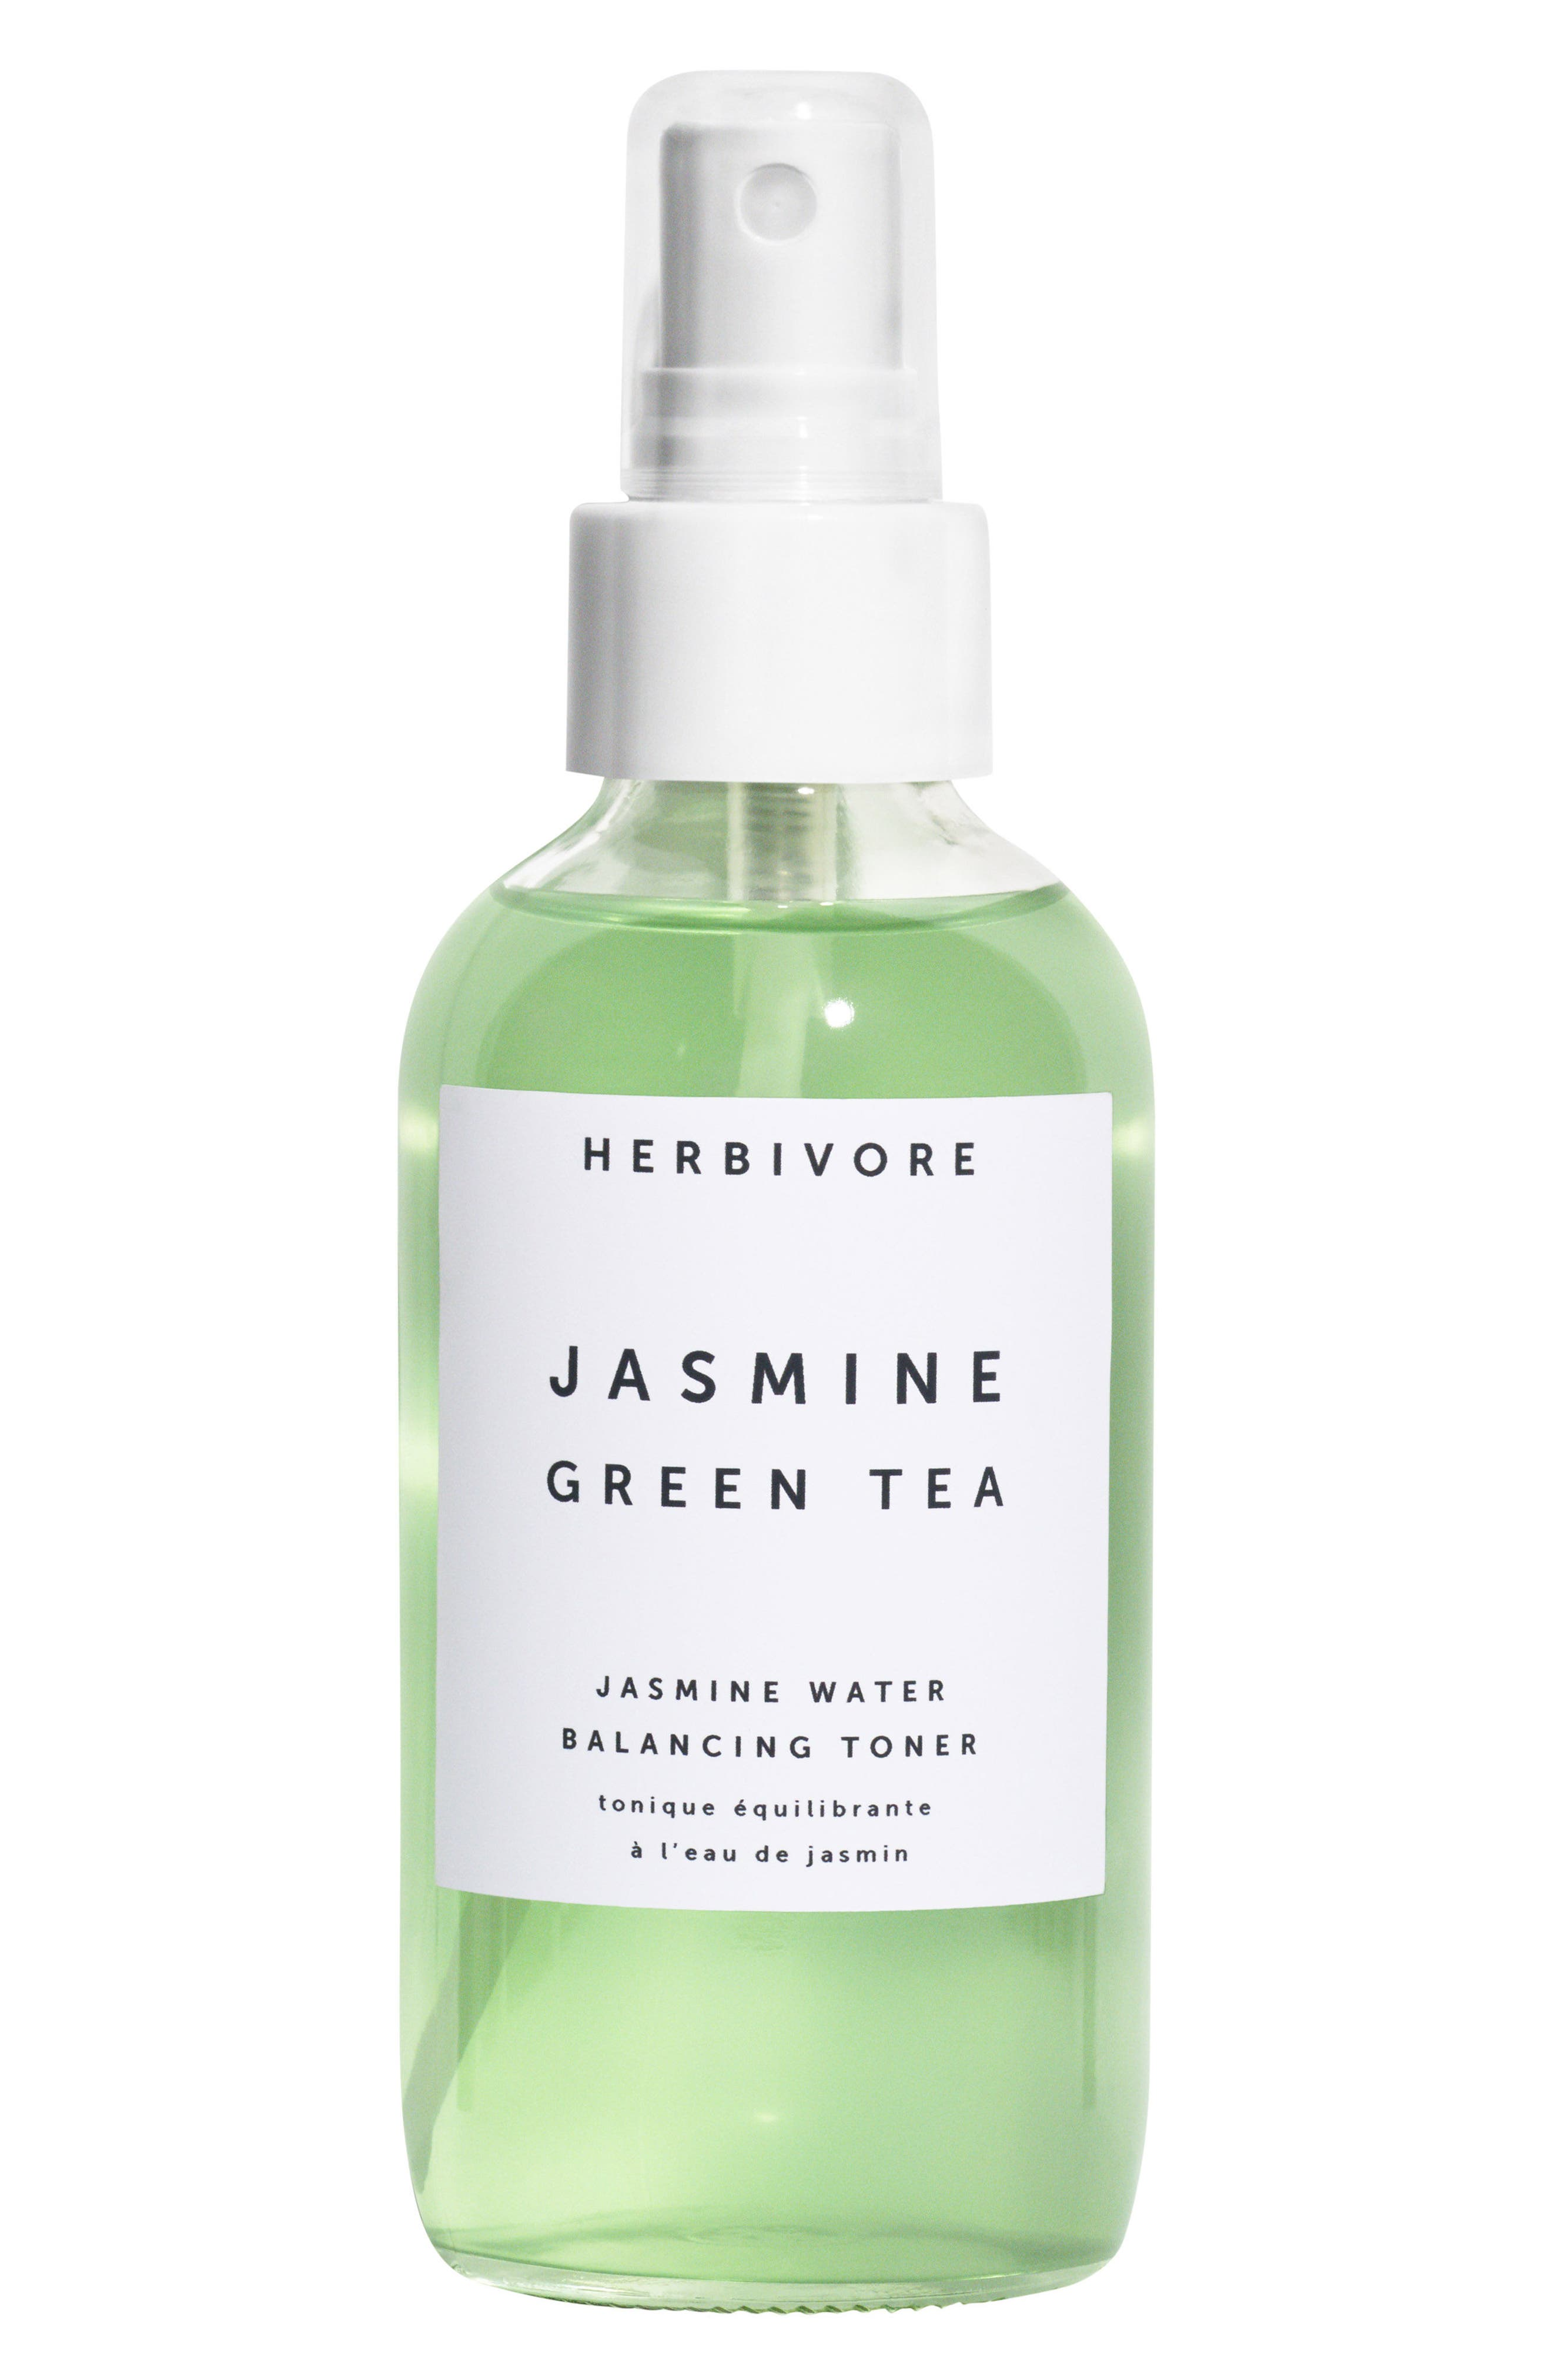 Jasmine Green Tea Balancing Toner